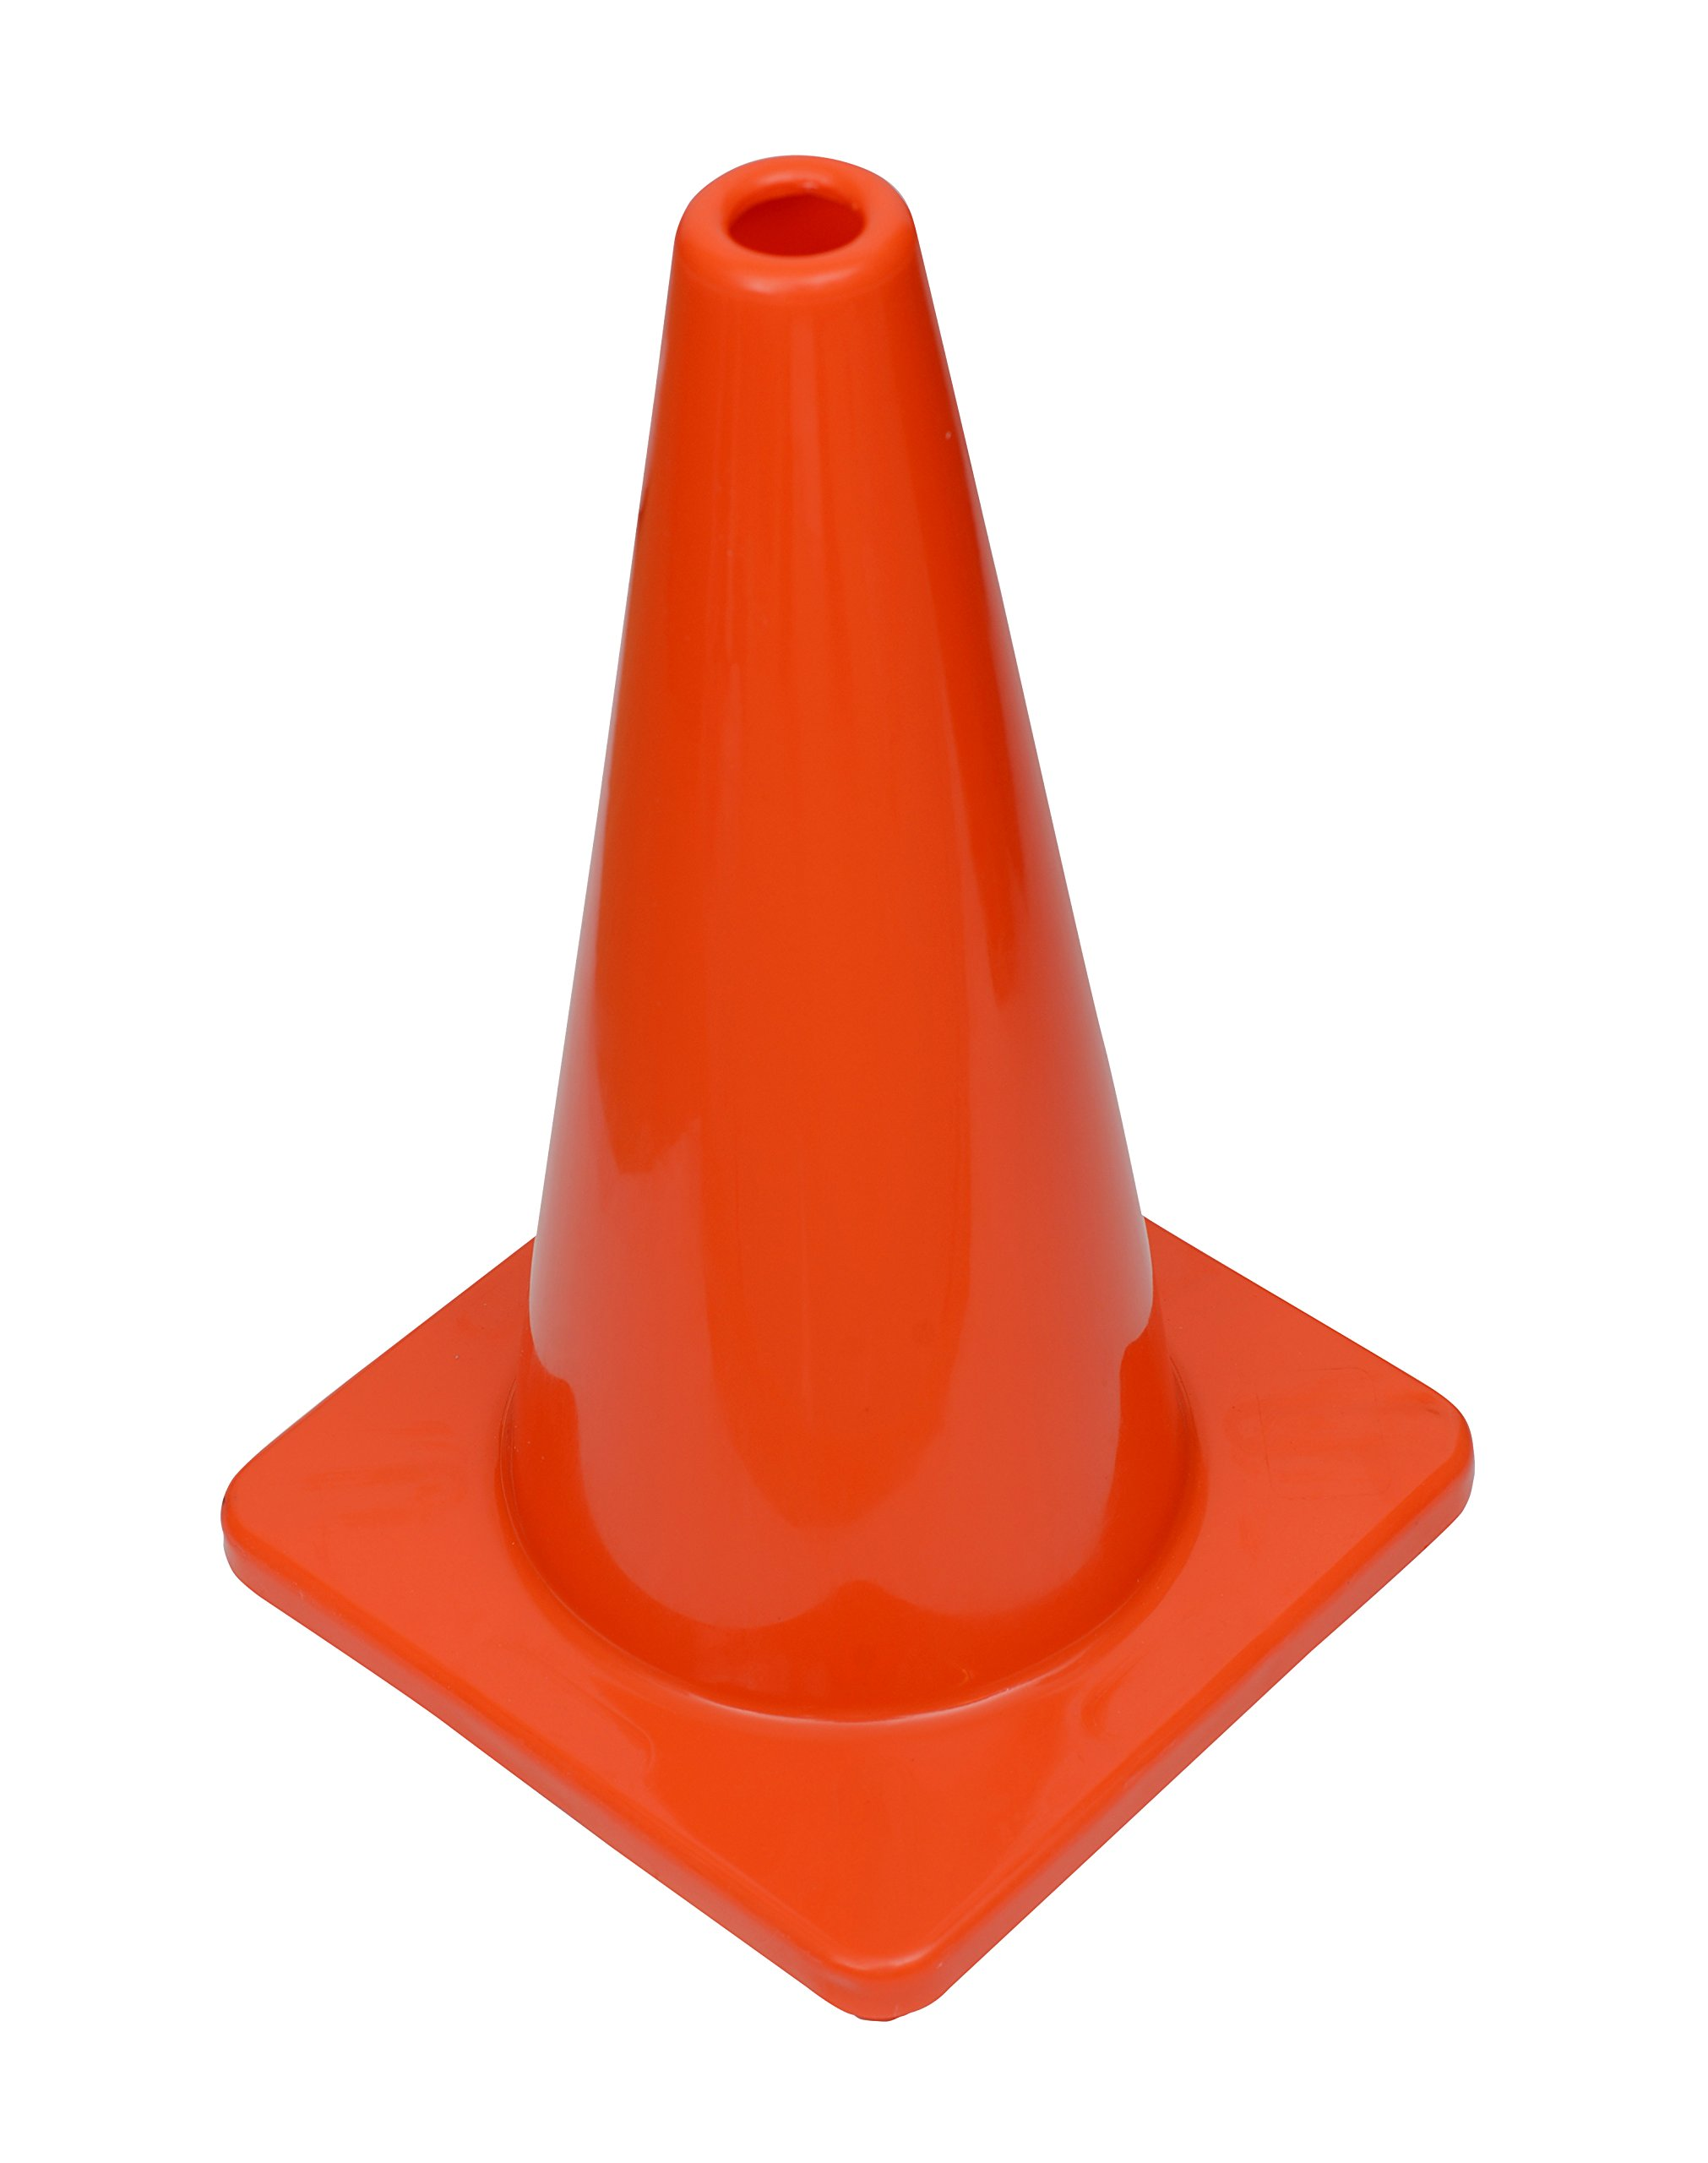 (Set of 12) CJ Safety 18'' Orange Premium PVC Safety Cones - No Reflective Collar (12 Cones) by CJ Safety (Image #2)